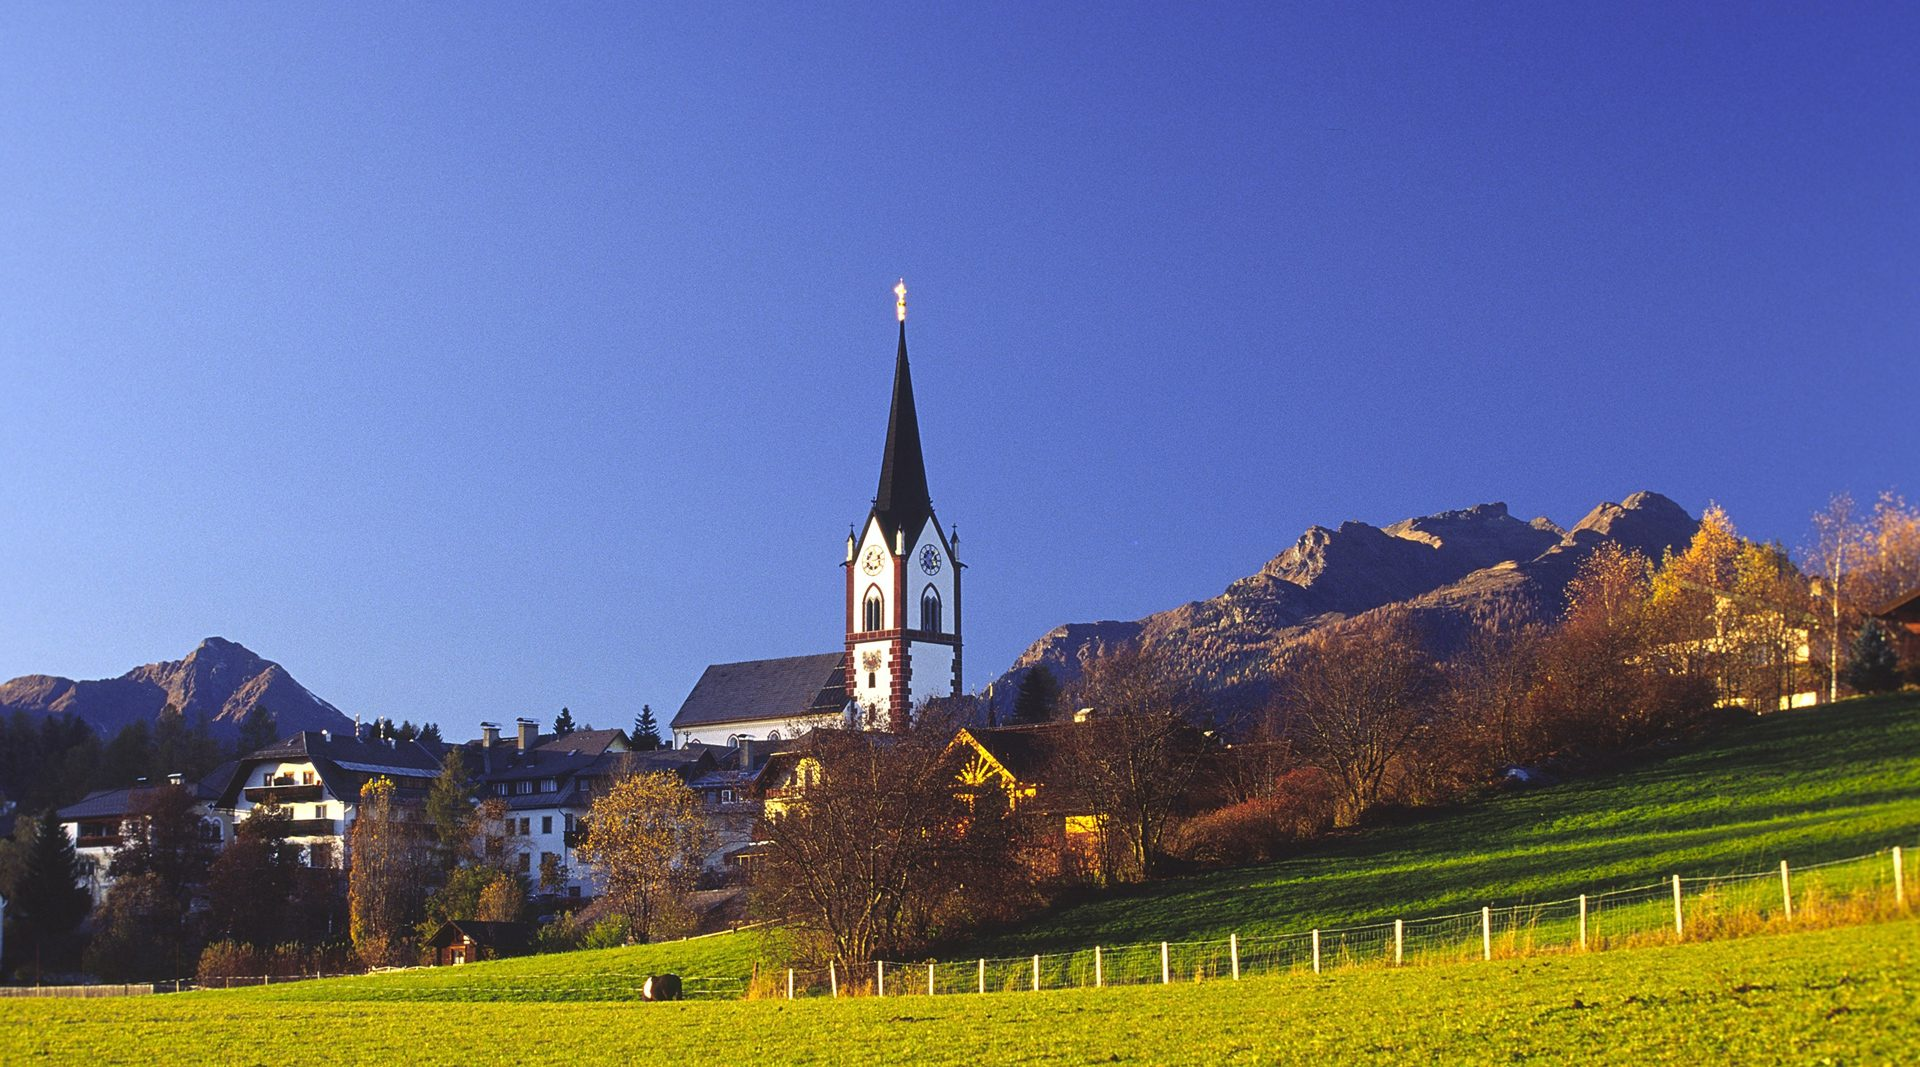 Blick auf Mariapfarr mit dem pägnanten Kirchturm